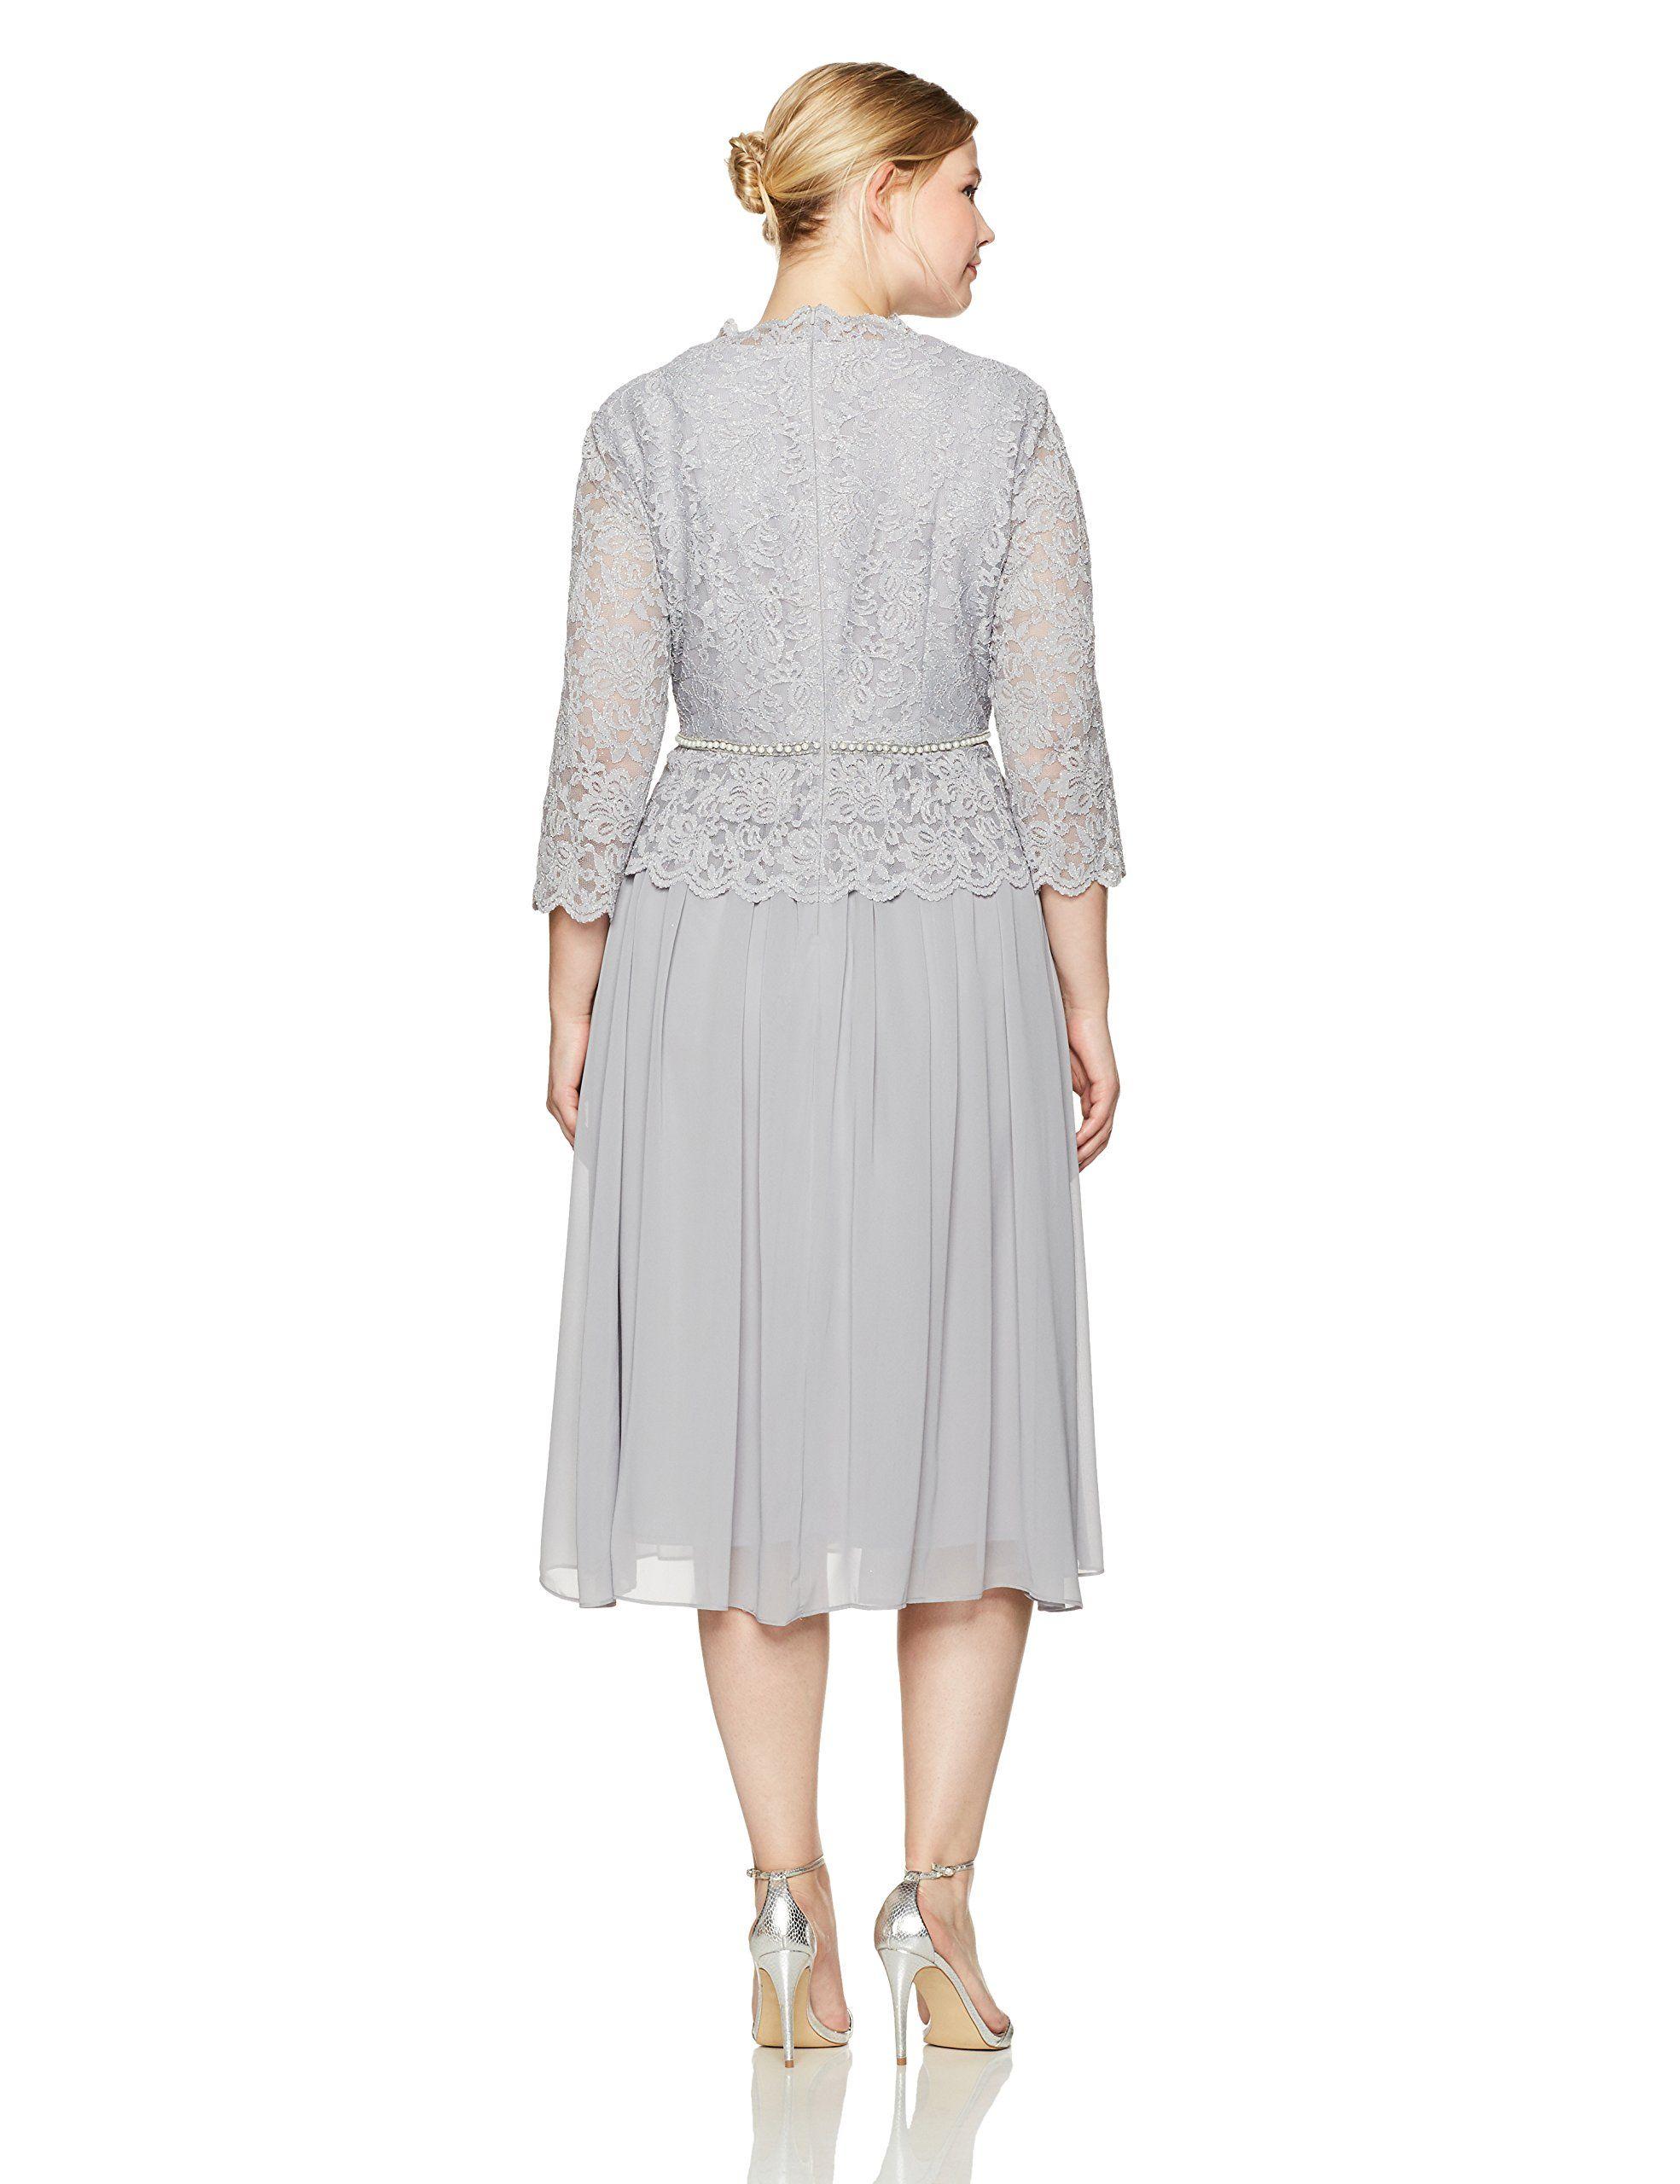 af3f92da902 Alex Evenings Womens PlusSize Fauxwrap Mock Lace Dress with Tea Length  Skirt Silver 24W     Click image for more details-affiliate link.